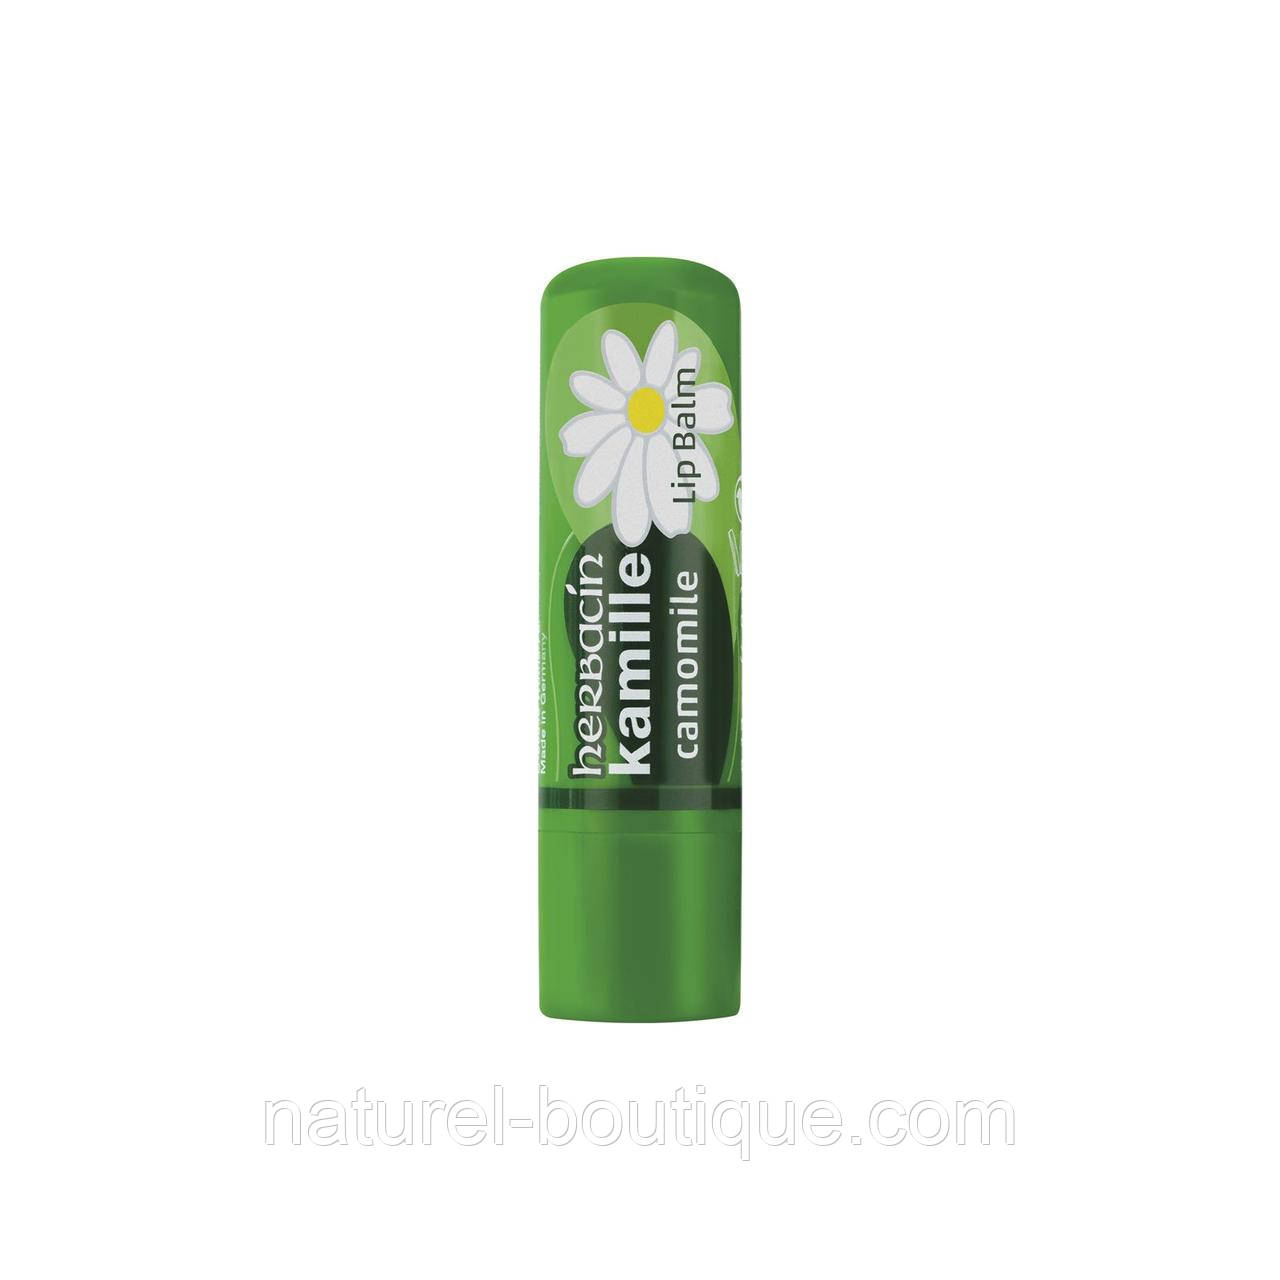 Бальзам для губ Herbacin kamille Ромашка